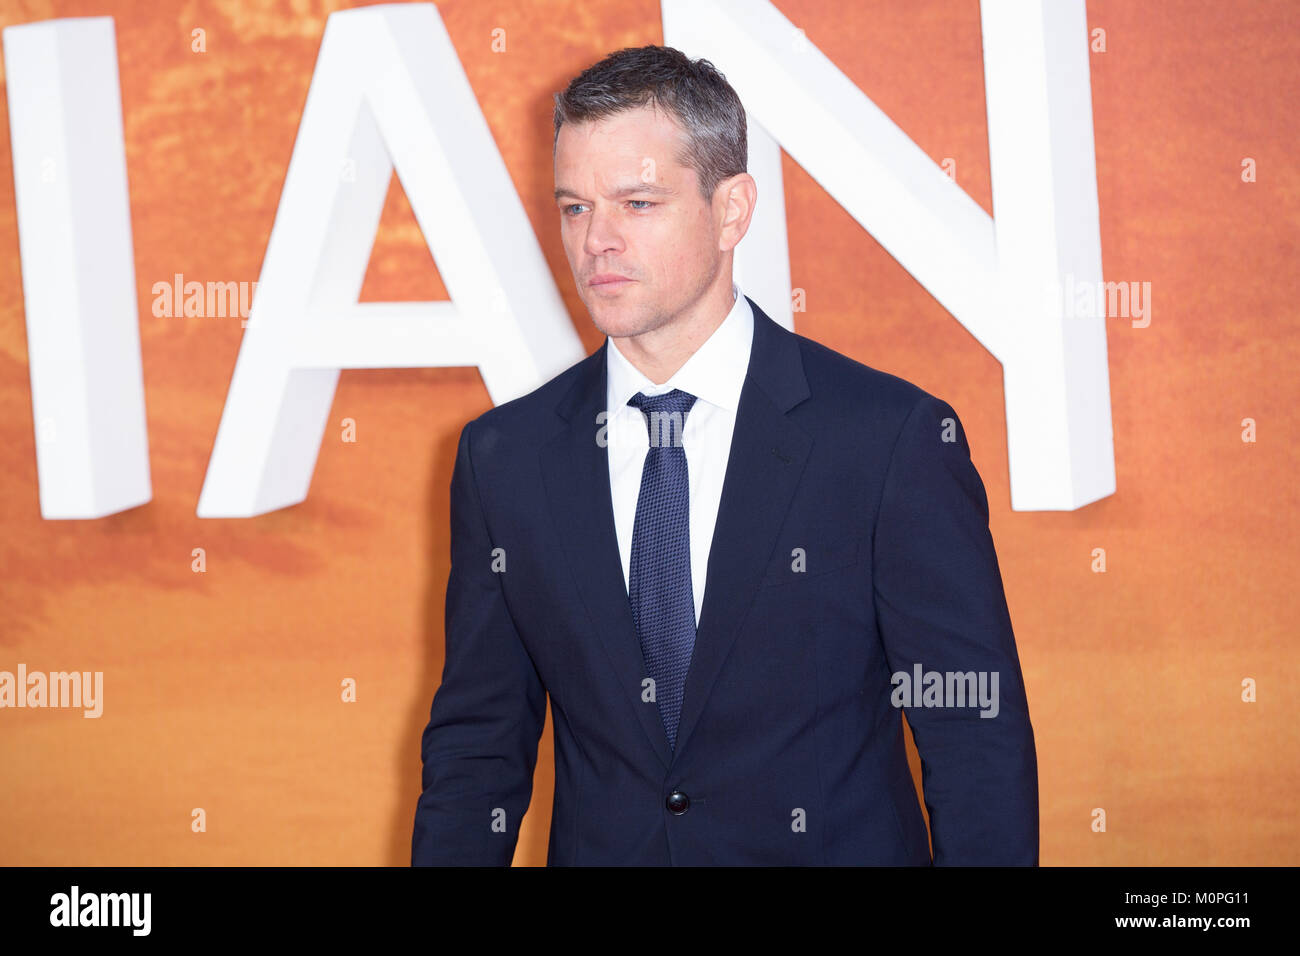 London, UK,  24 September 2015, Matt Damon , European Premiere of 'The Martian' at the Odeon Leicester Square. - Stock Image